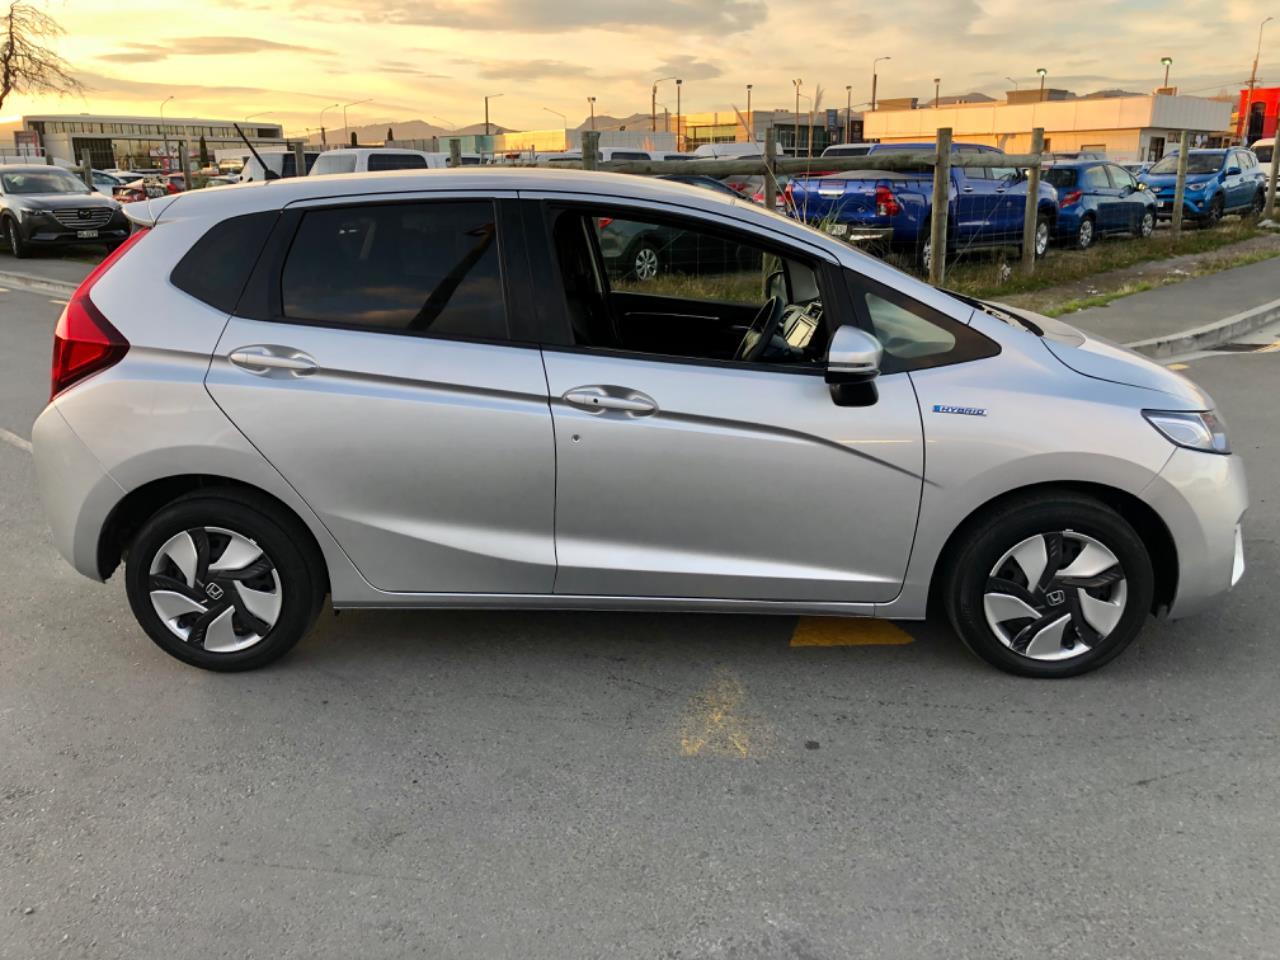 image-4, 2015 Honda Fit Hybrid F-Package at Christchurch